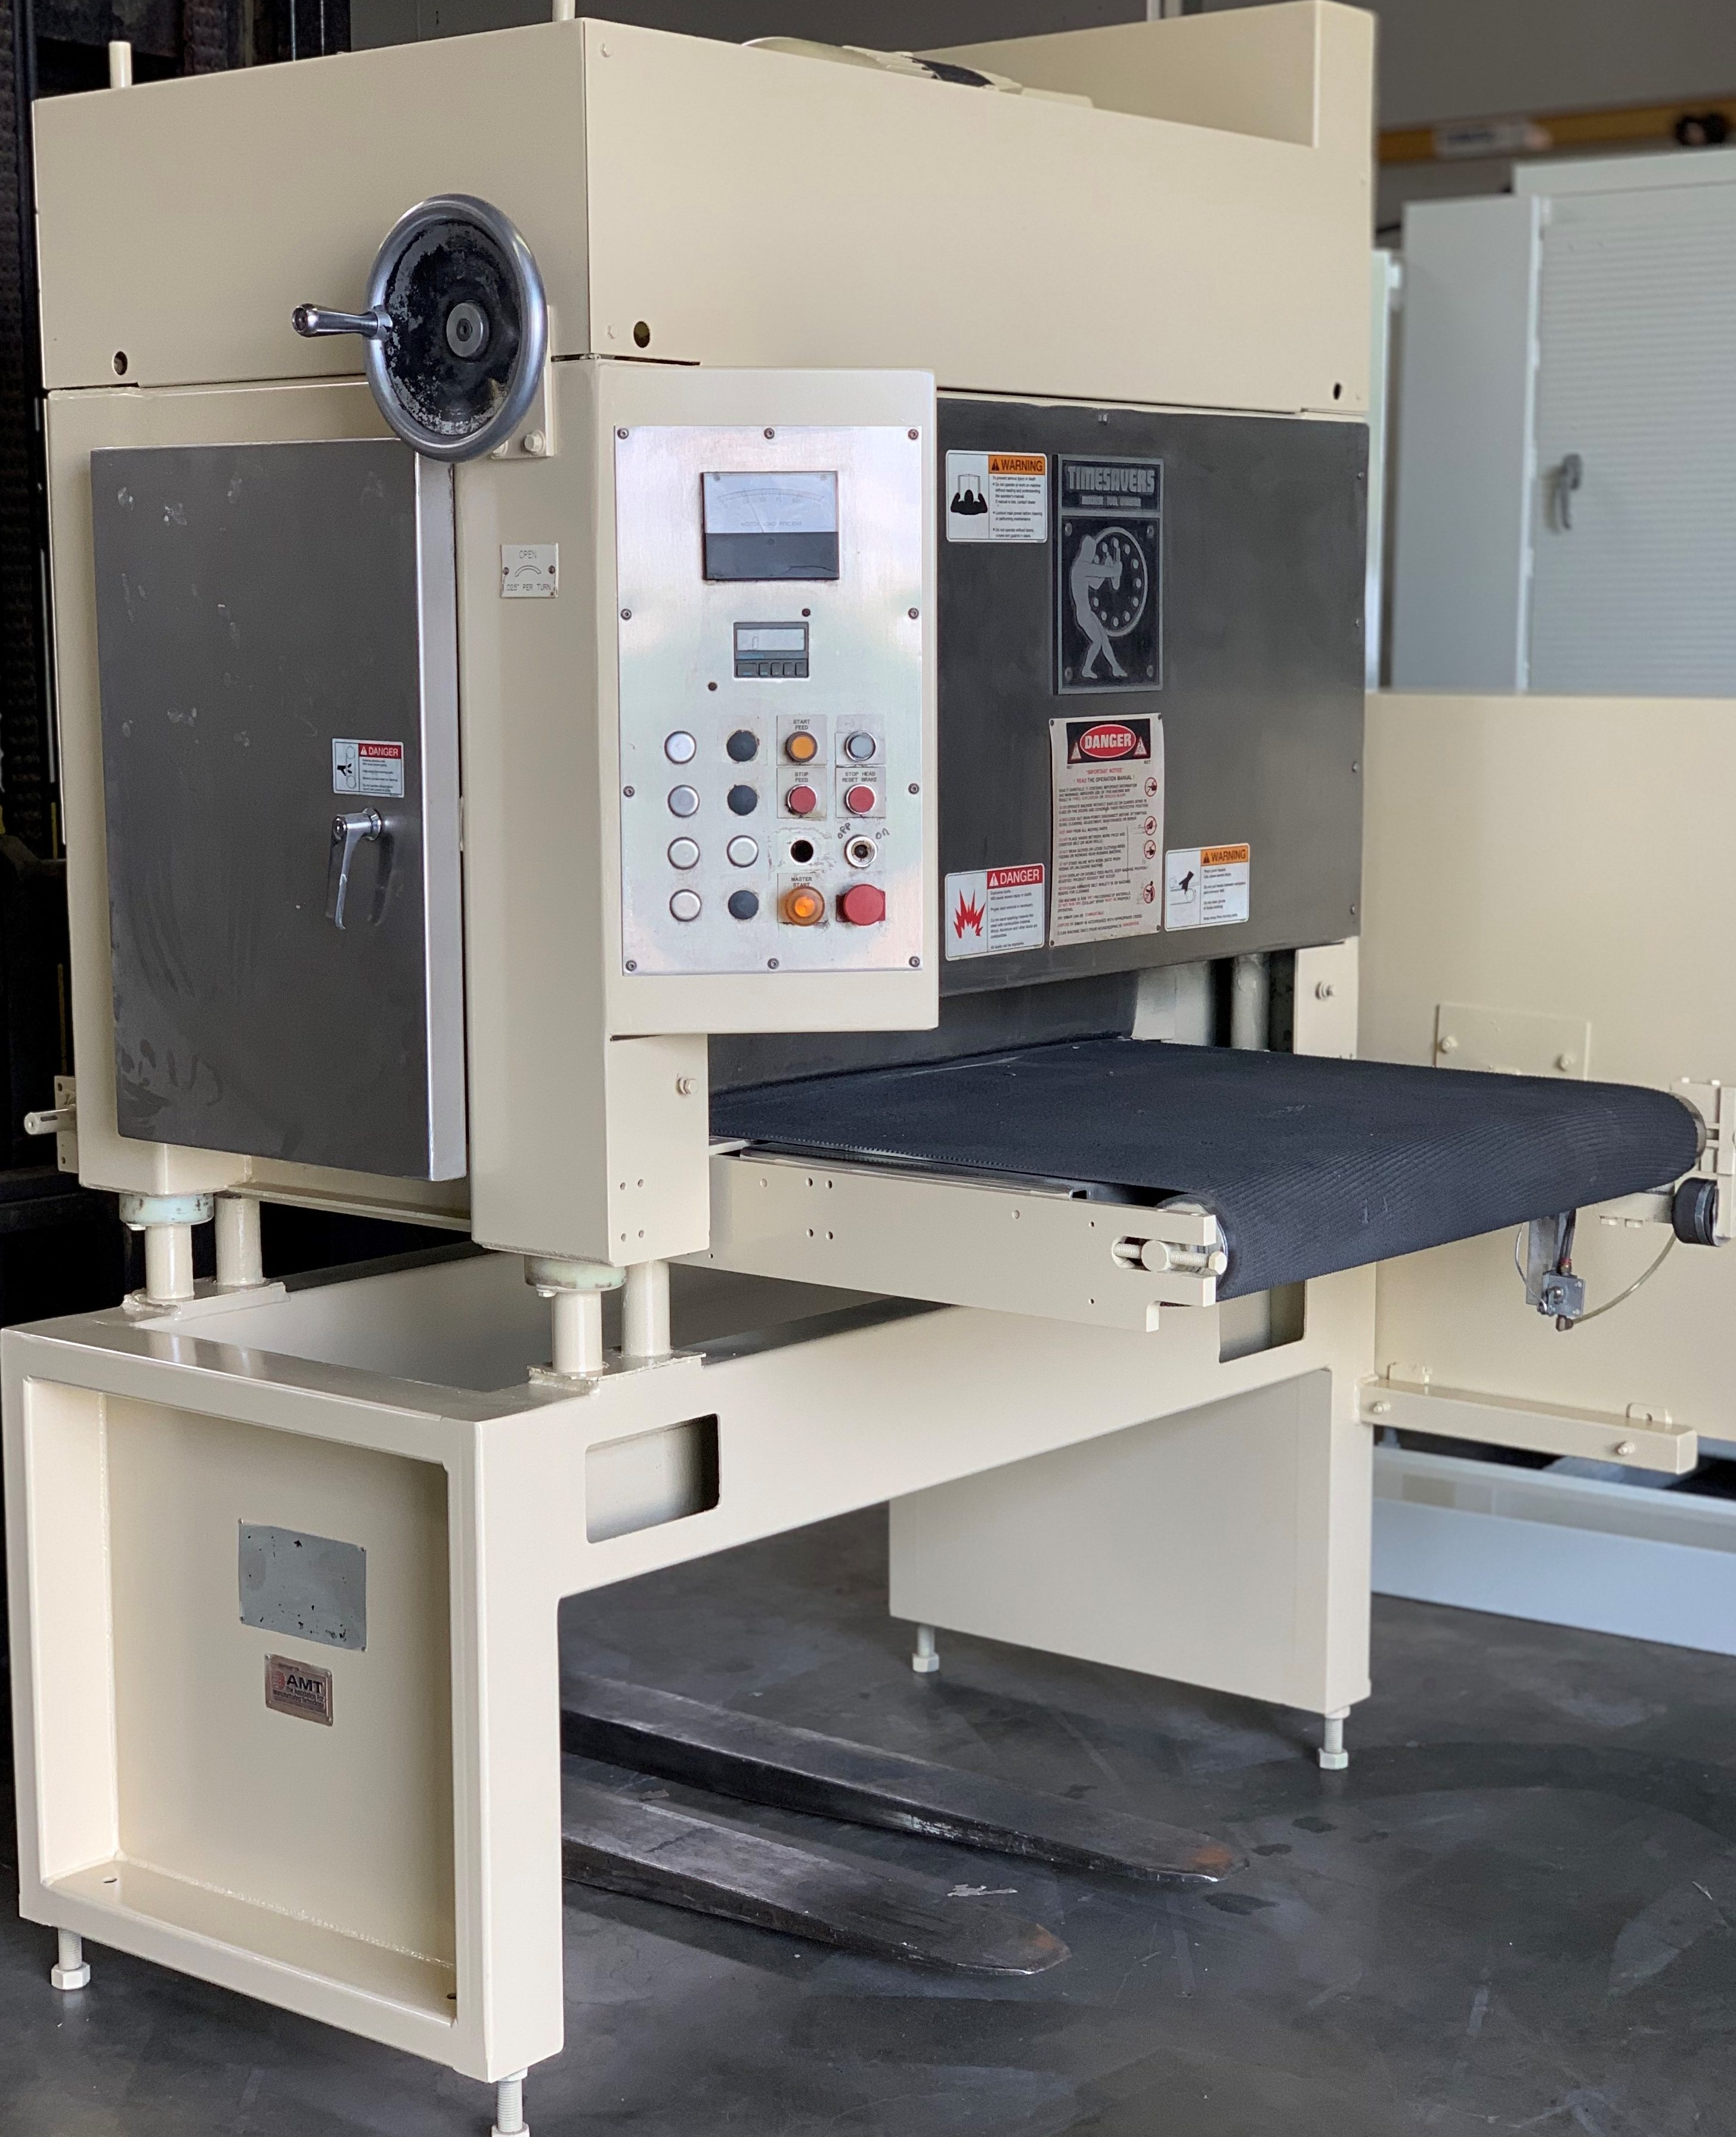 Used Machine Shop Equipment in Pomona, CA - Timesaver 37″ Dry 137-1HP/7